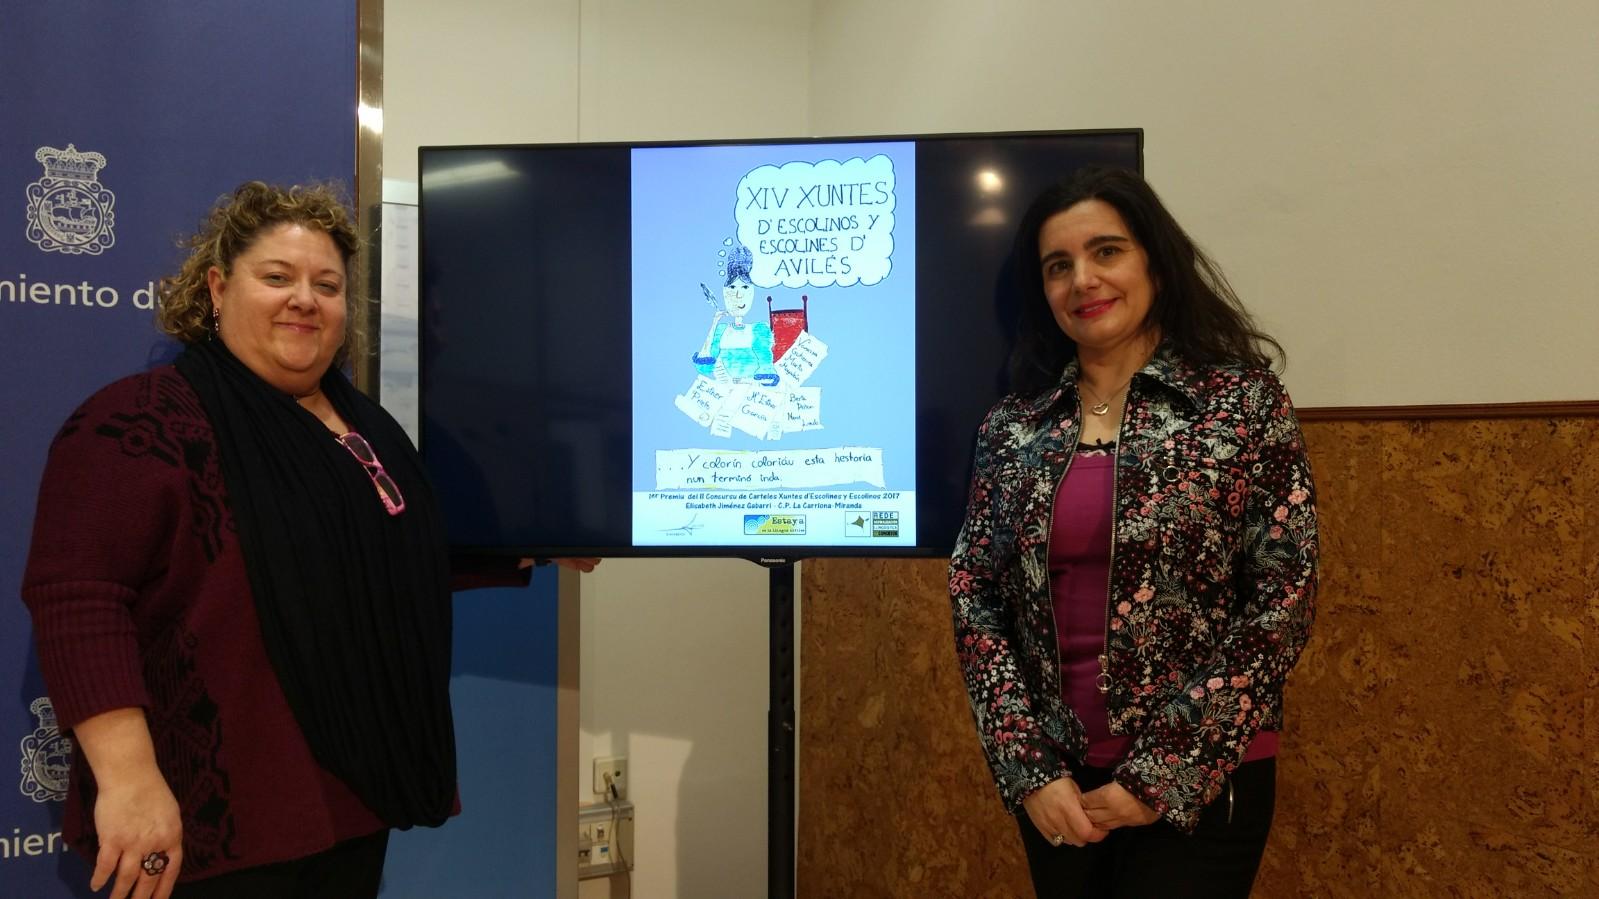 Les XIV Xuntes d'Escolines y Escolinos d'Avilés van contar cola participación de 530 alumnos